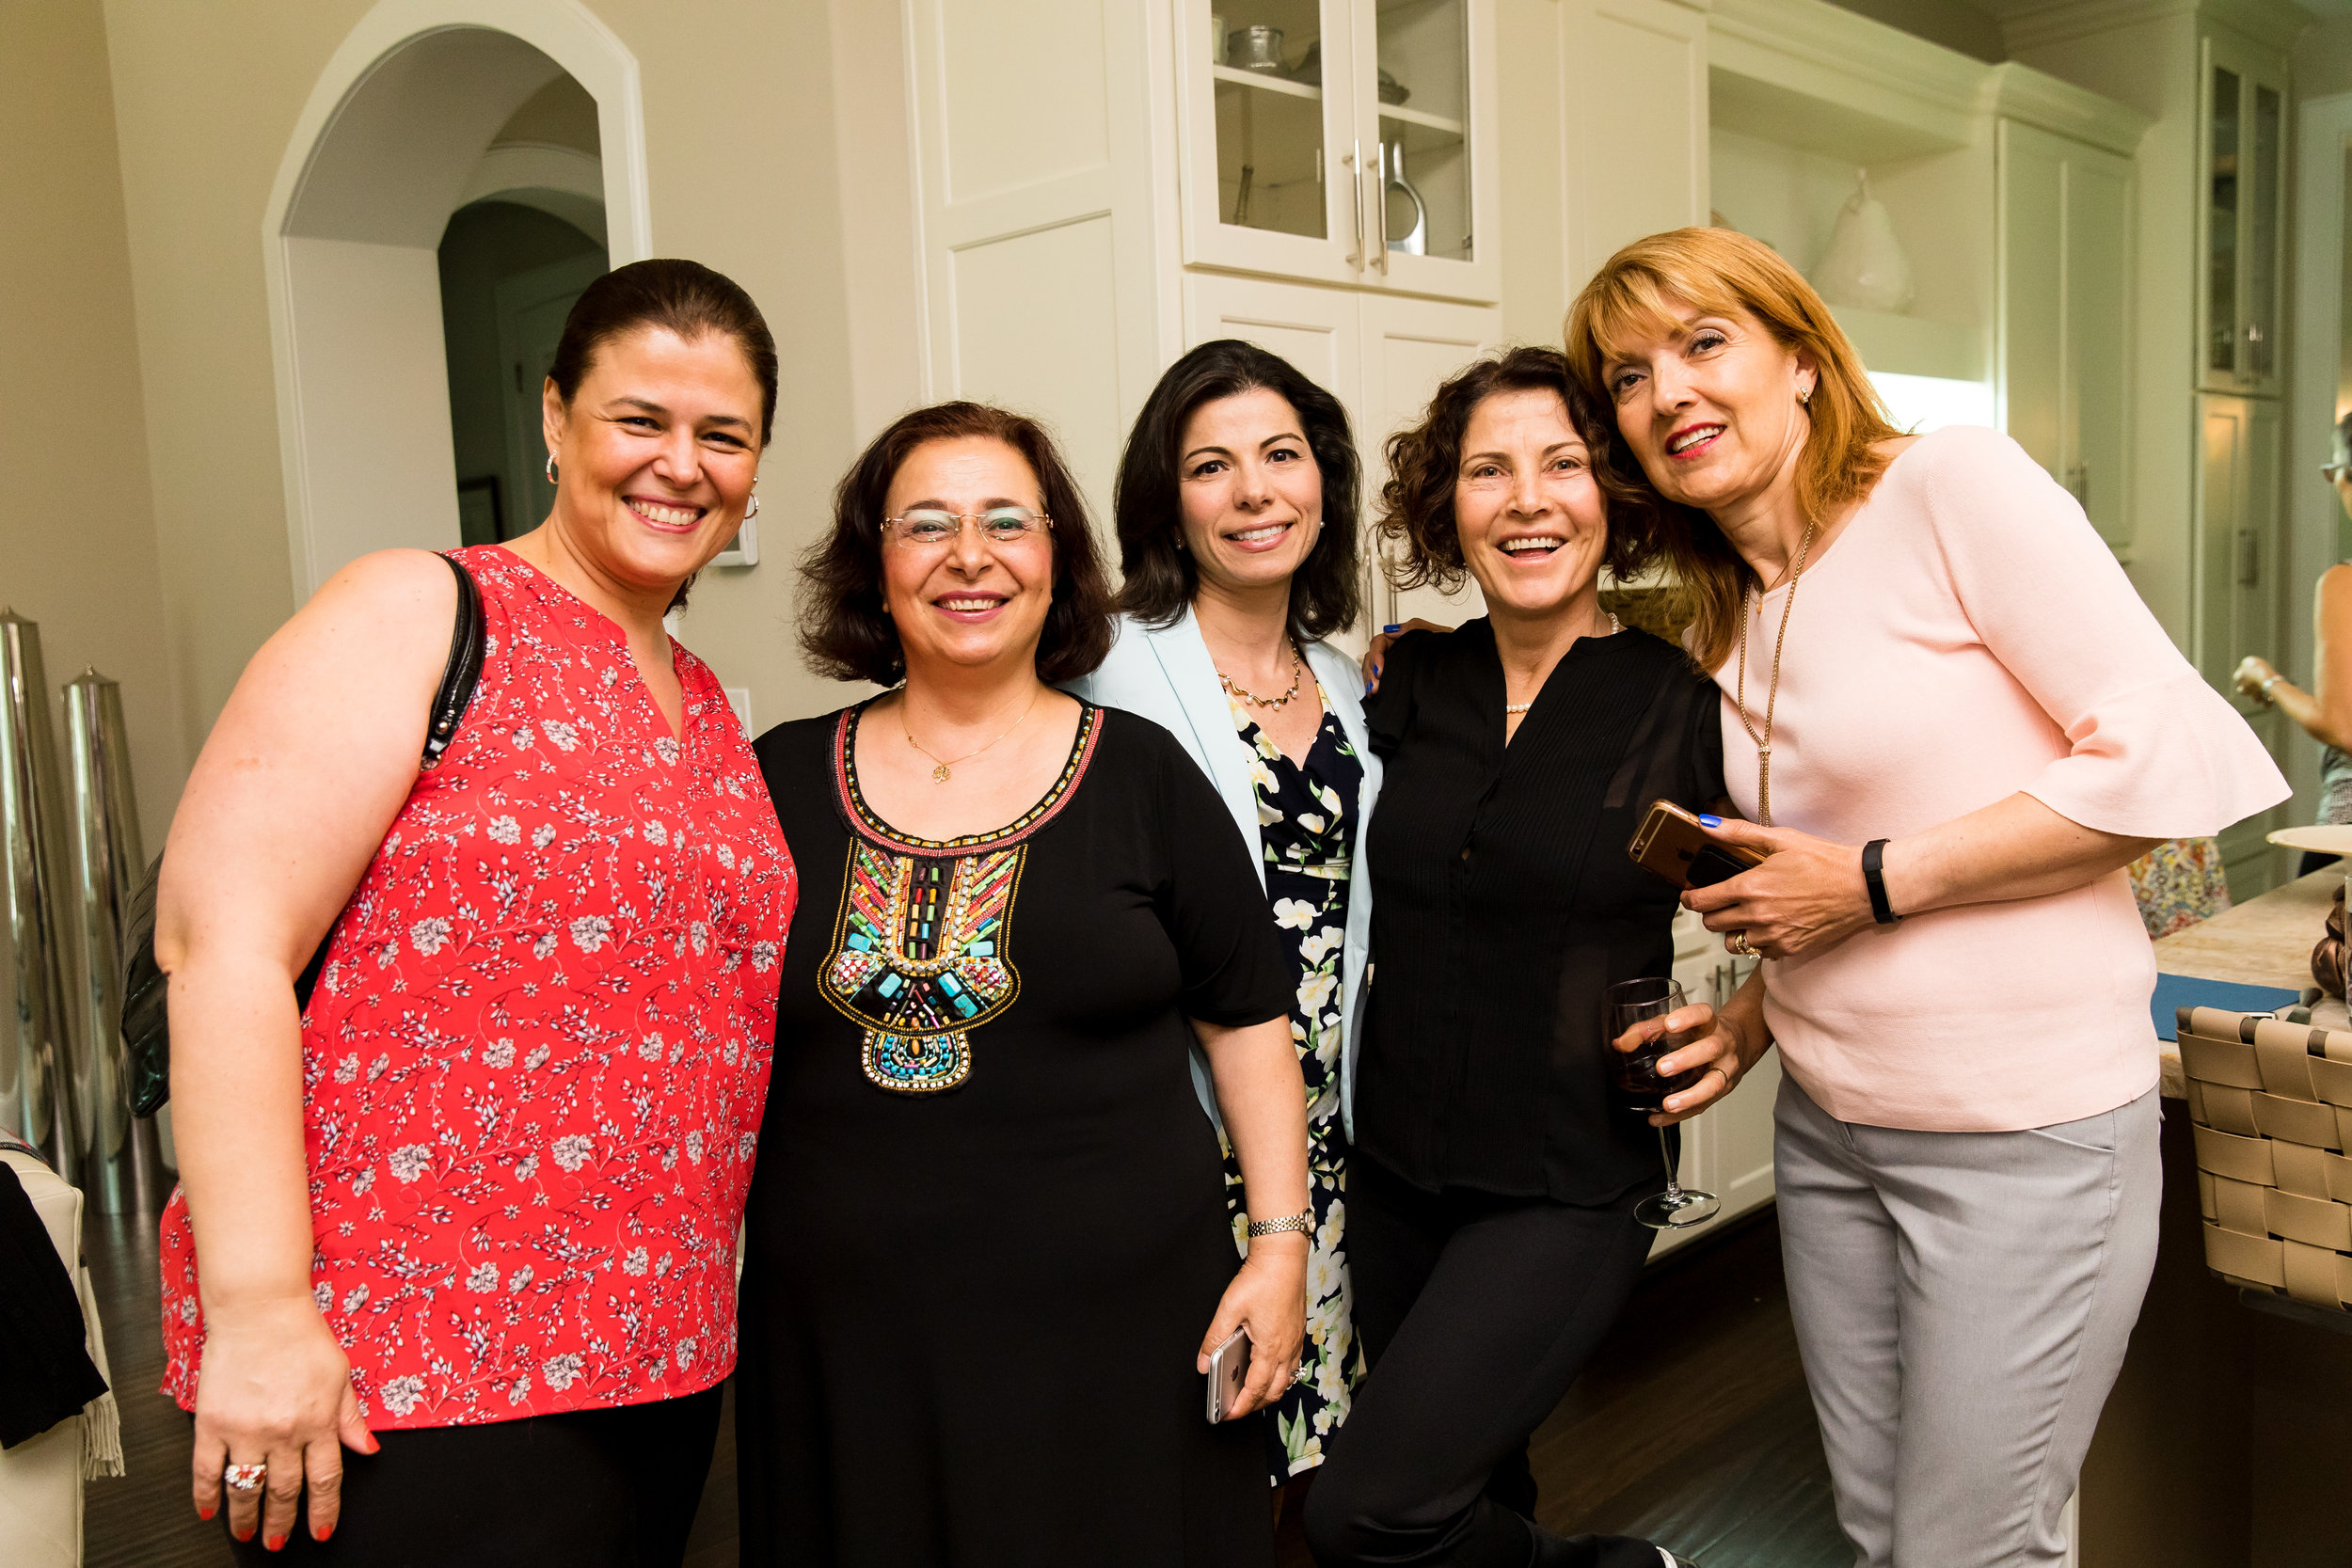 20180421-3rd Annual Education Women Turkey-106.jpg